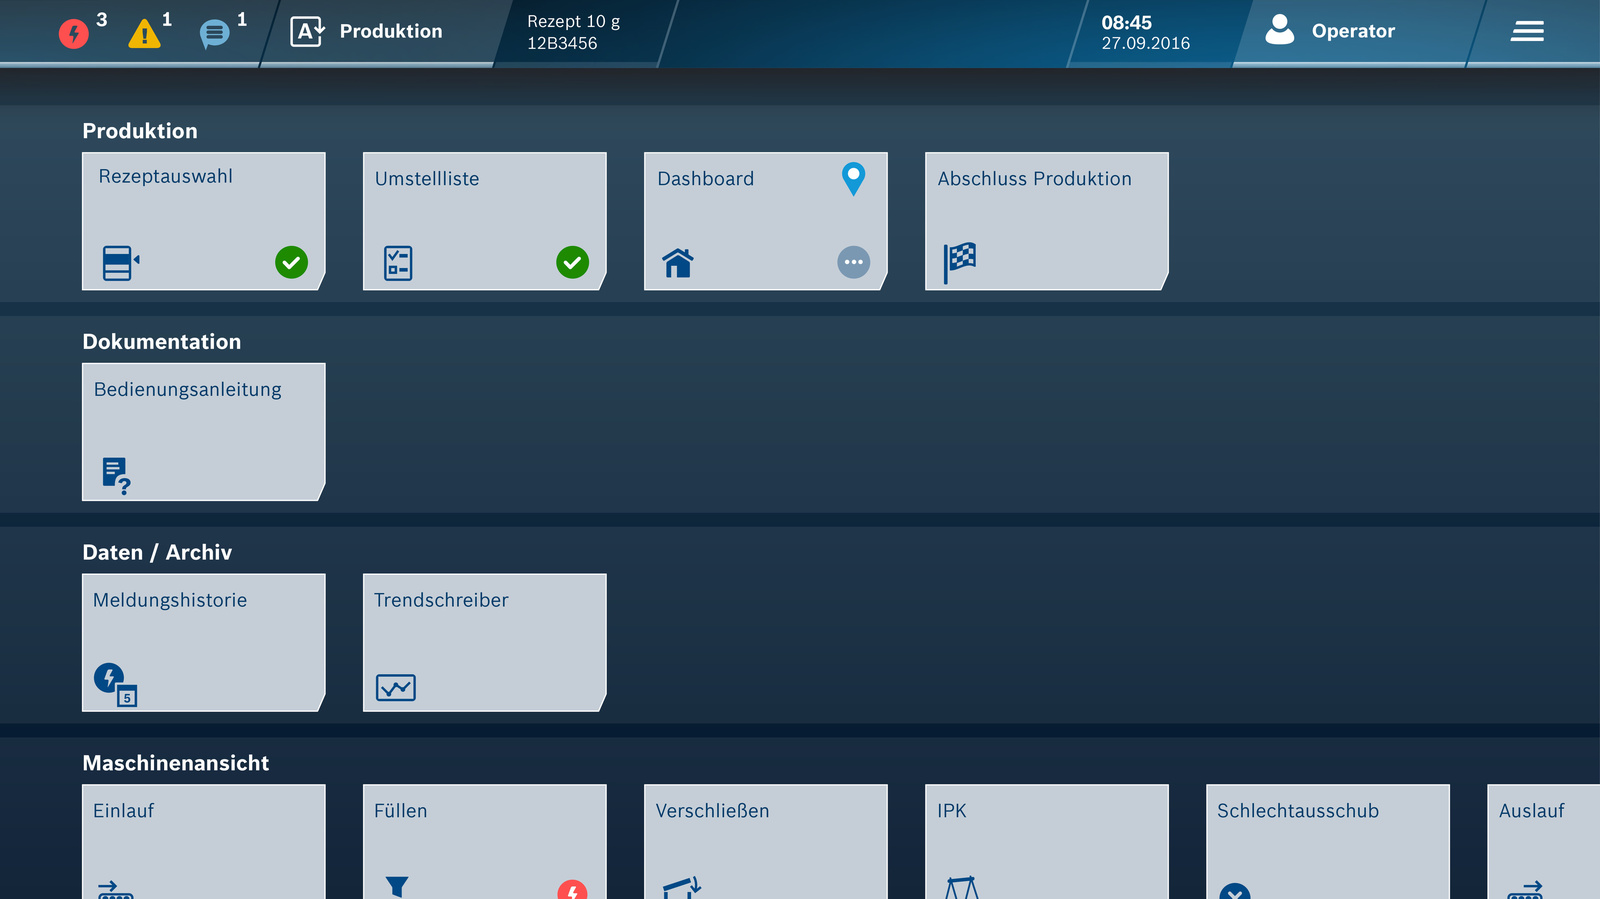 Intuitive Maschinenbedienung mit dem HMI 4.0